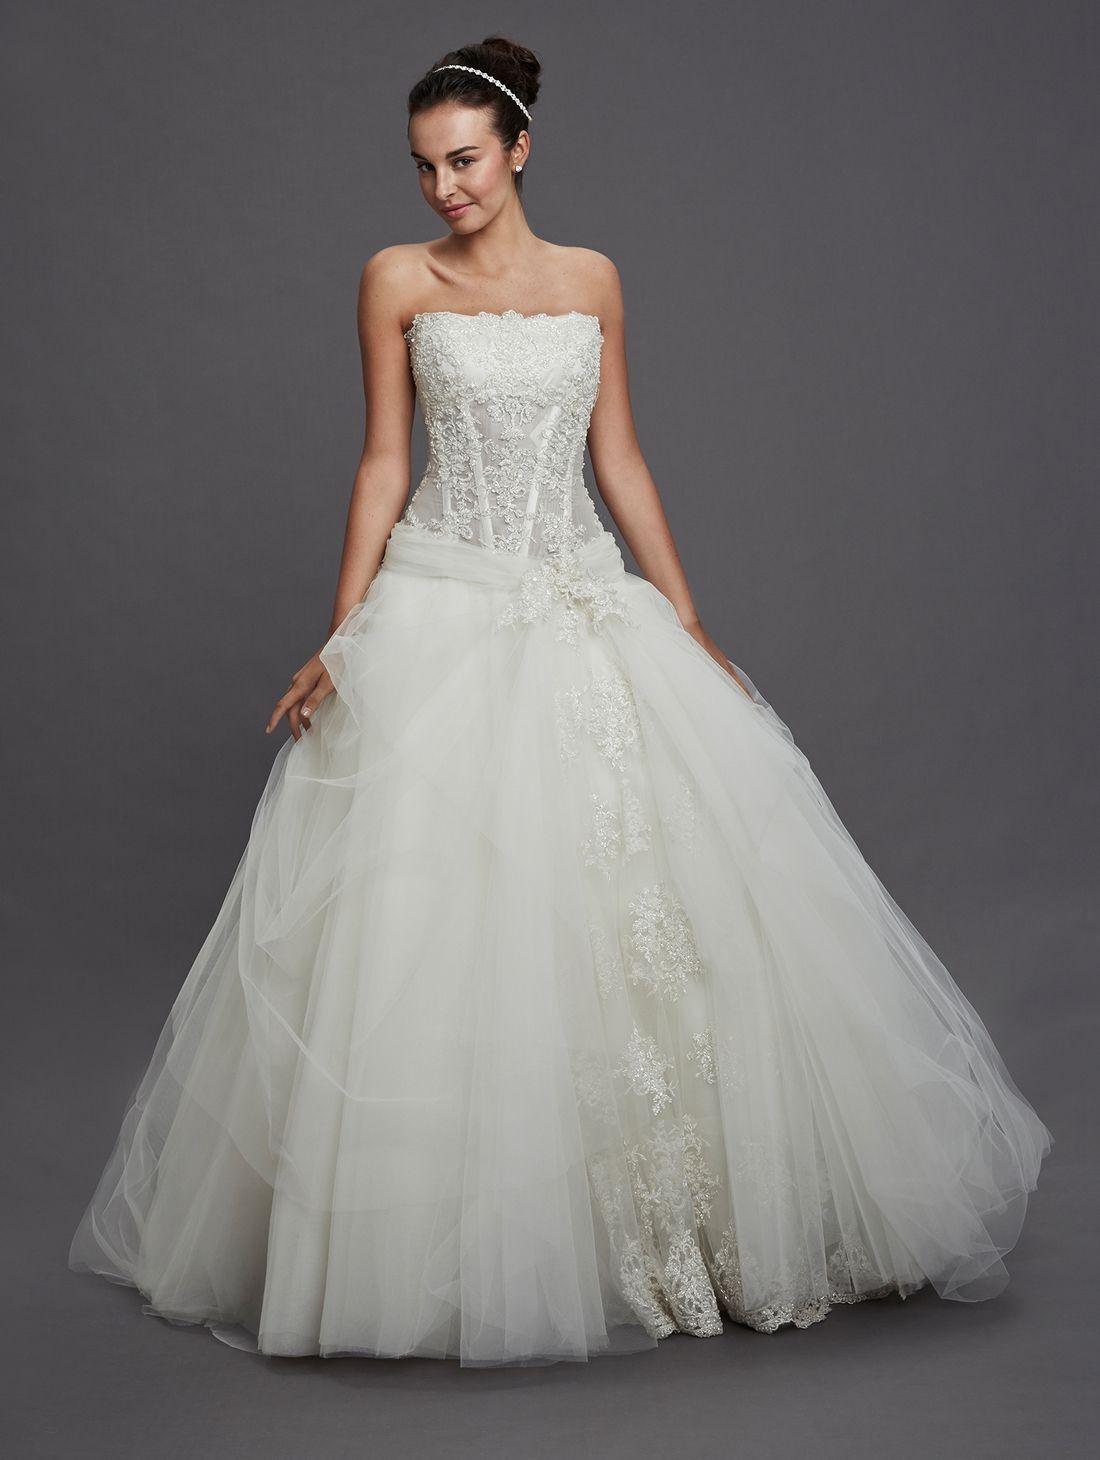 kleinfeldbridal pnina tornai bridal gown princess | wedding ...